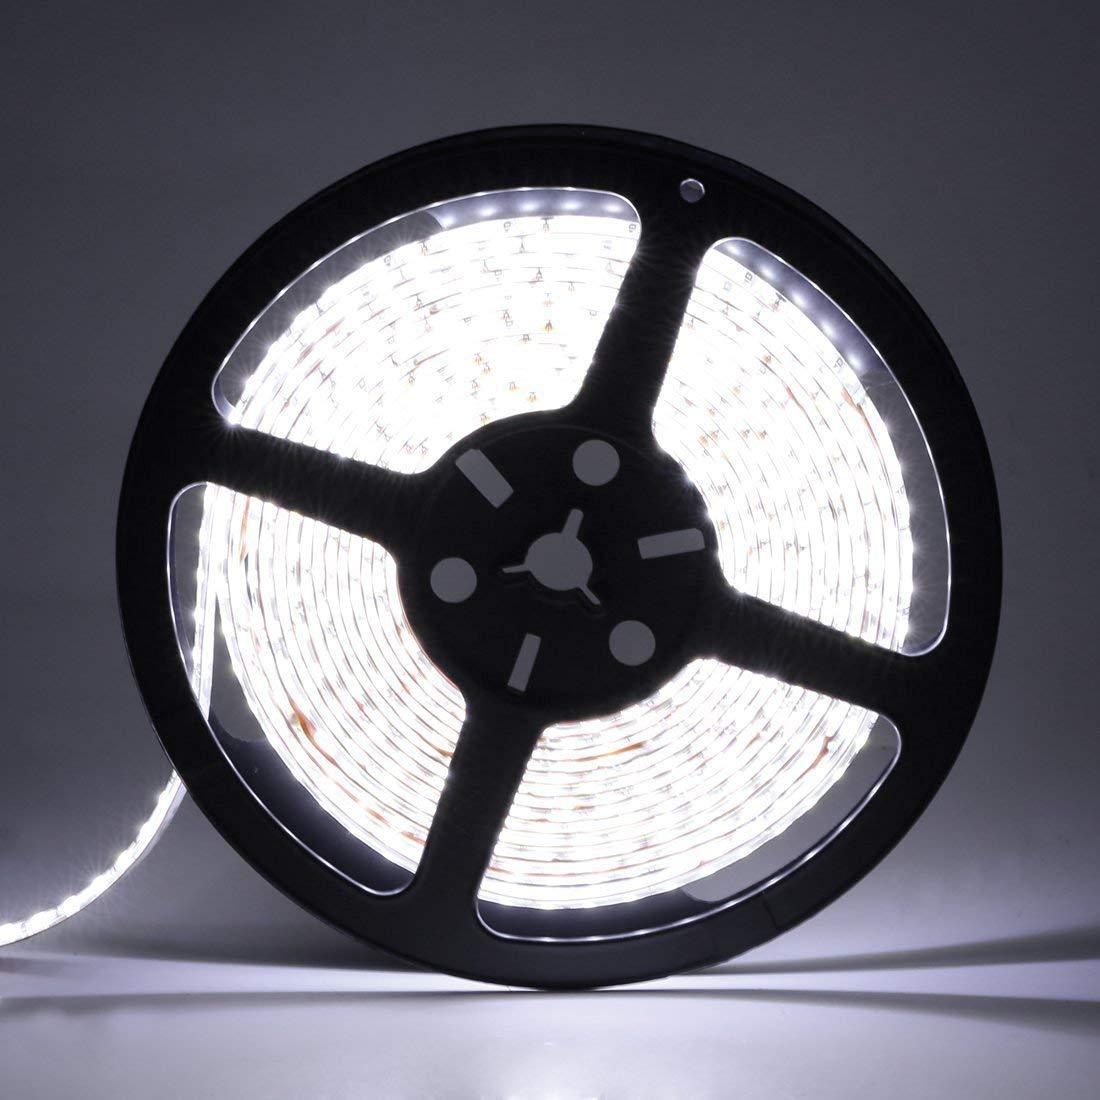 LEDMO LED Strip Lights SMD 2835 Non waterproof LED Strip DC12V 600LEDs 16.4Ft 6000K 15Lm LED High CRI80 LED Light Strips 3 times brightness than SMD3528 LED Strip White